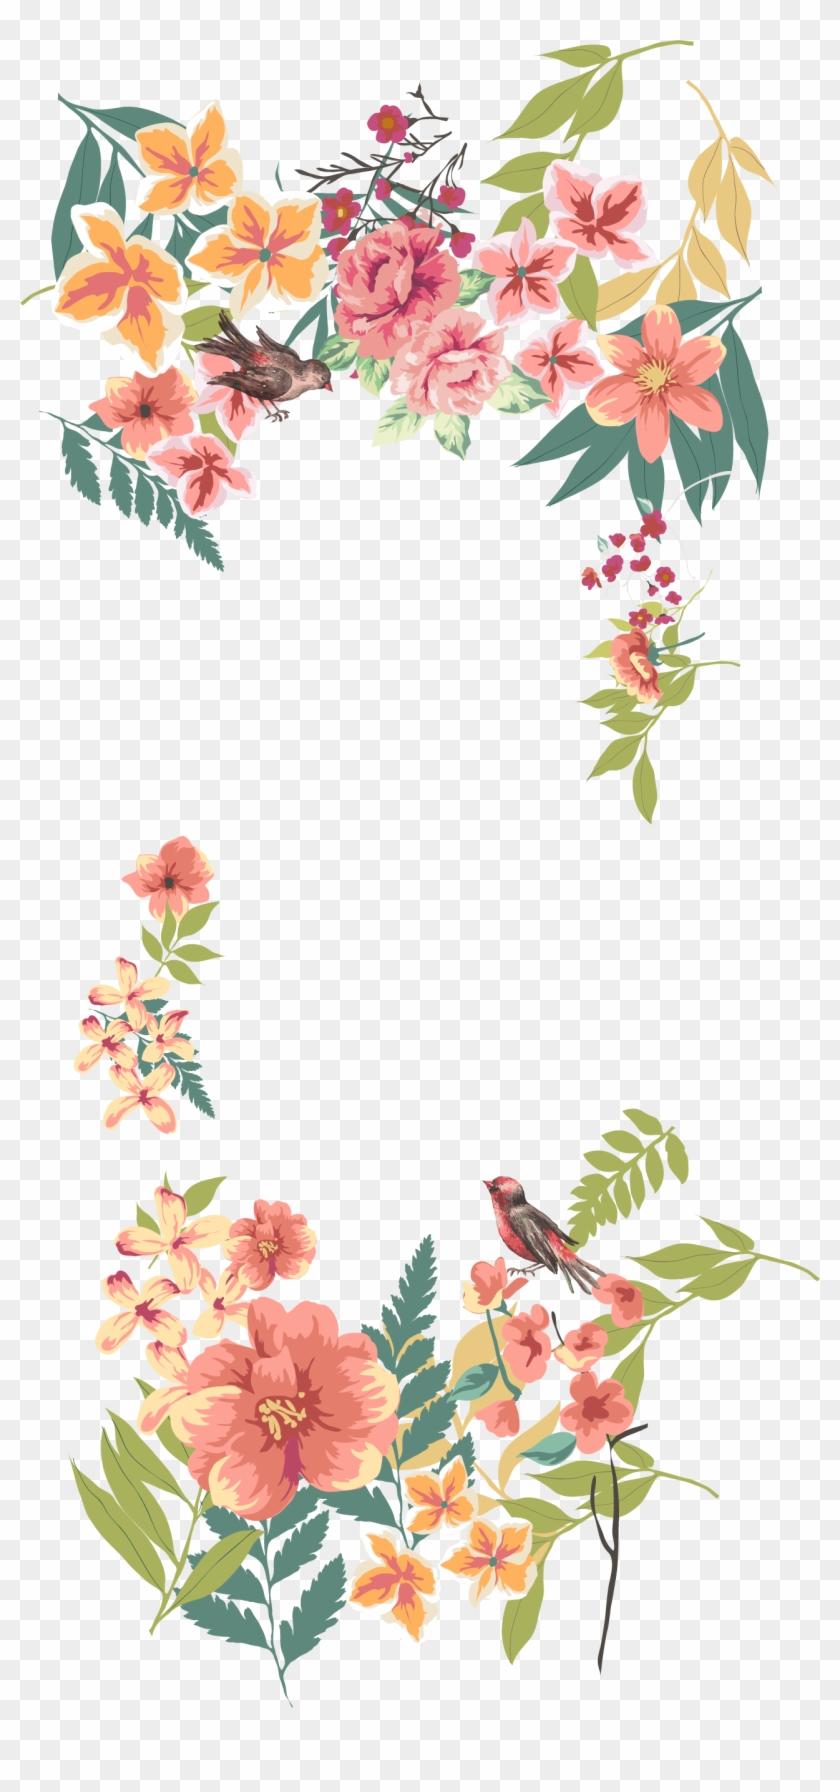 Flower Euclidean Vector Floral Design - Flower Border Png Clipart #463257